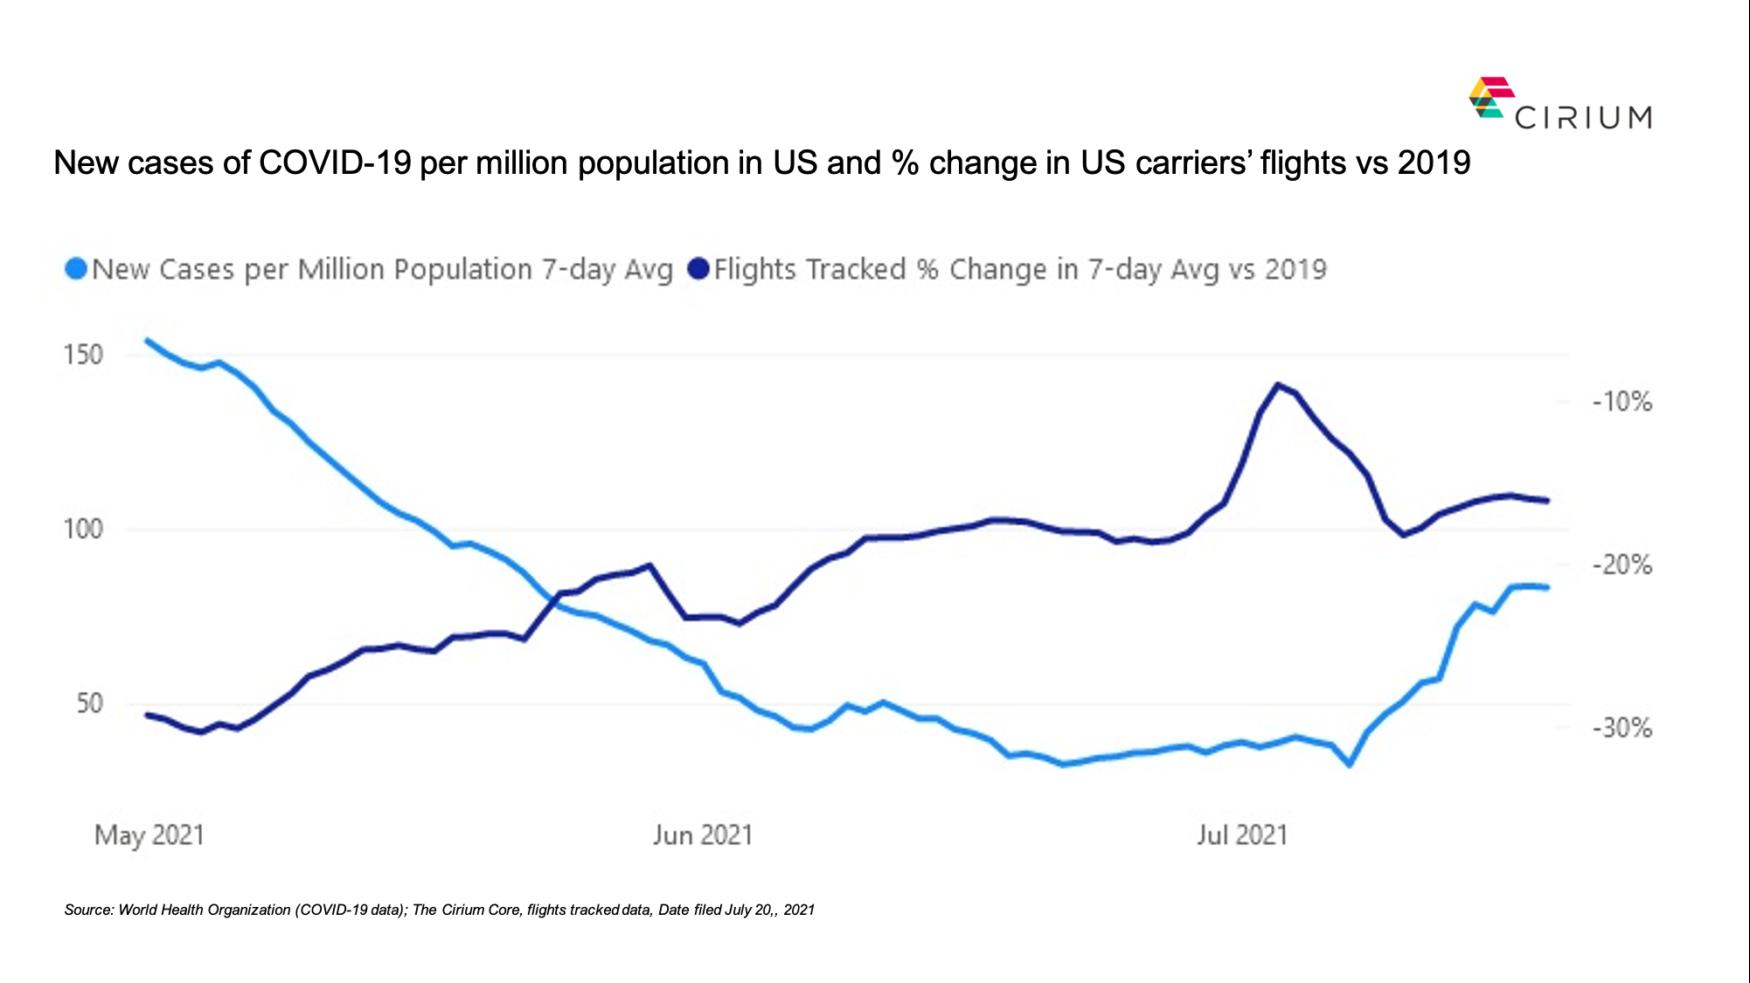 Recovery in US flights flattens amid COVID's resurgence